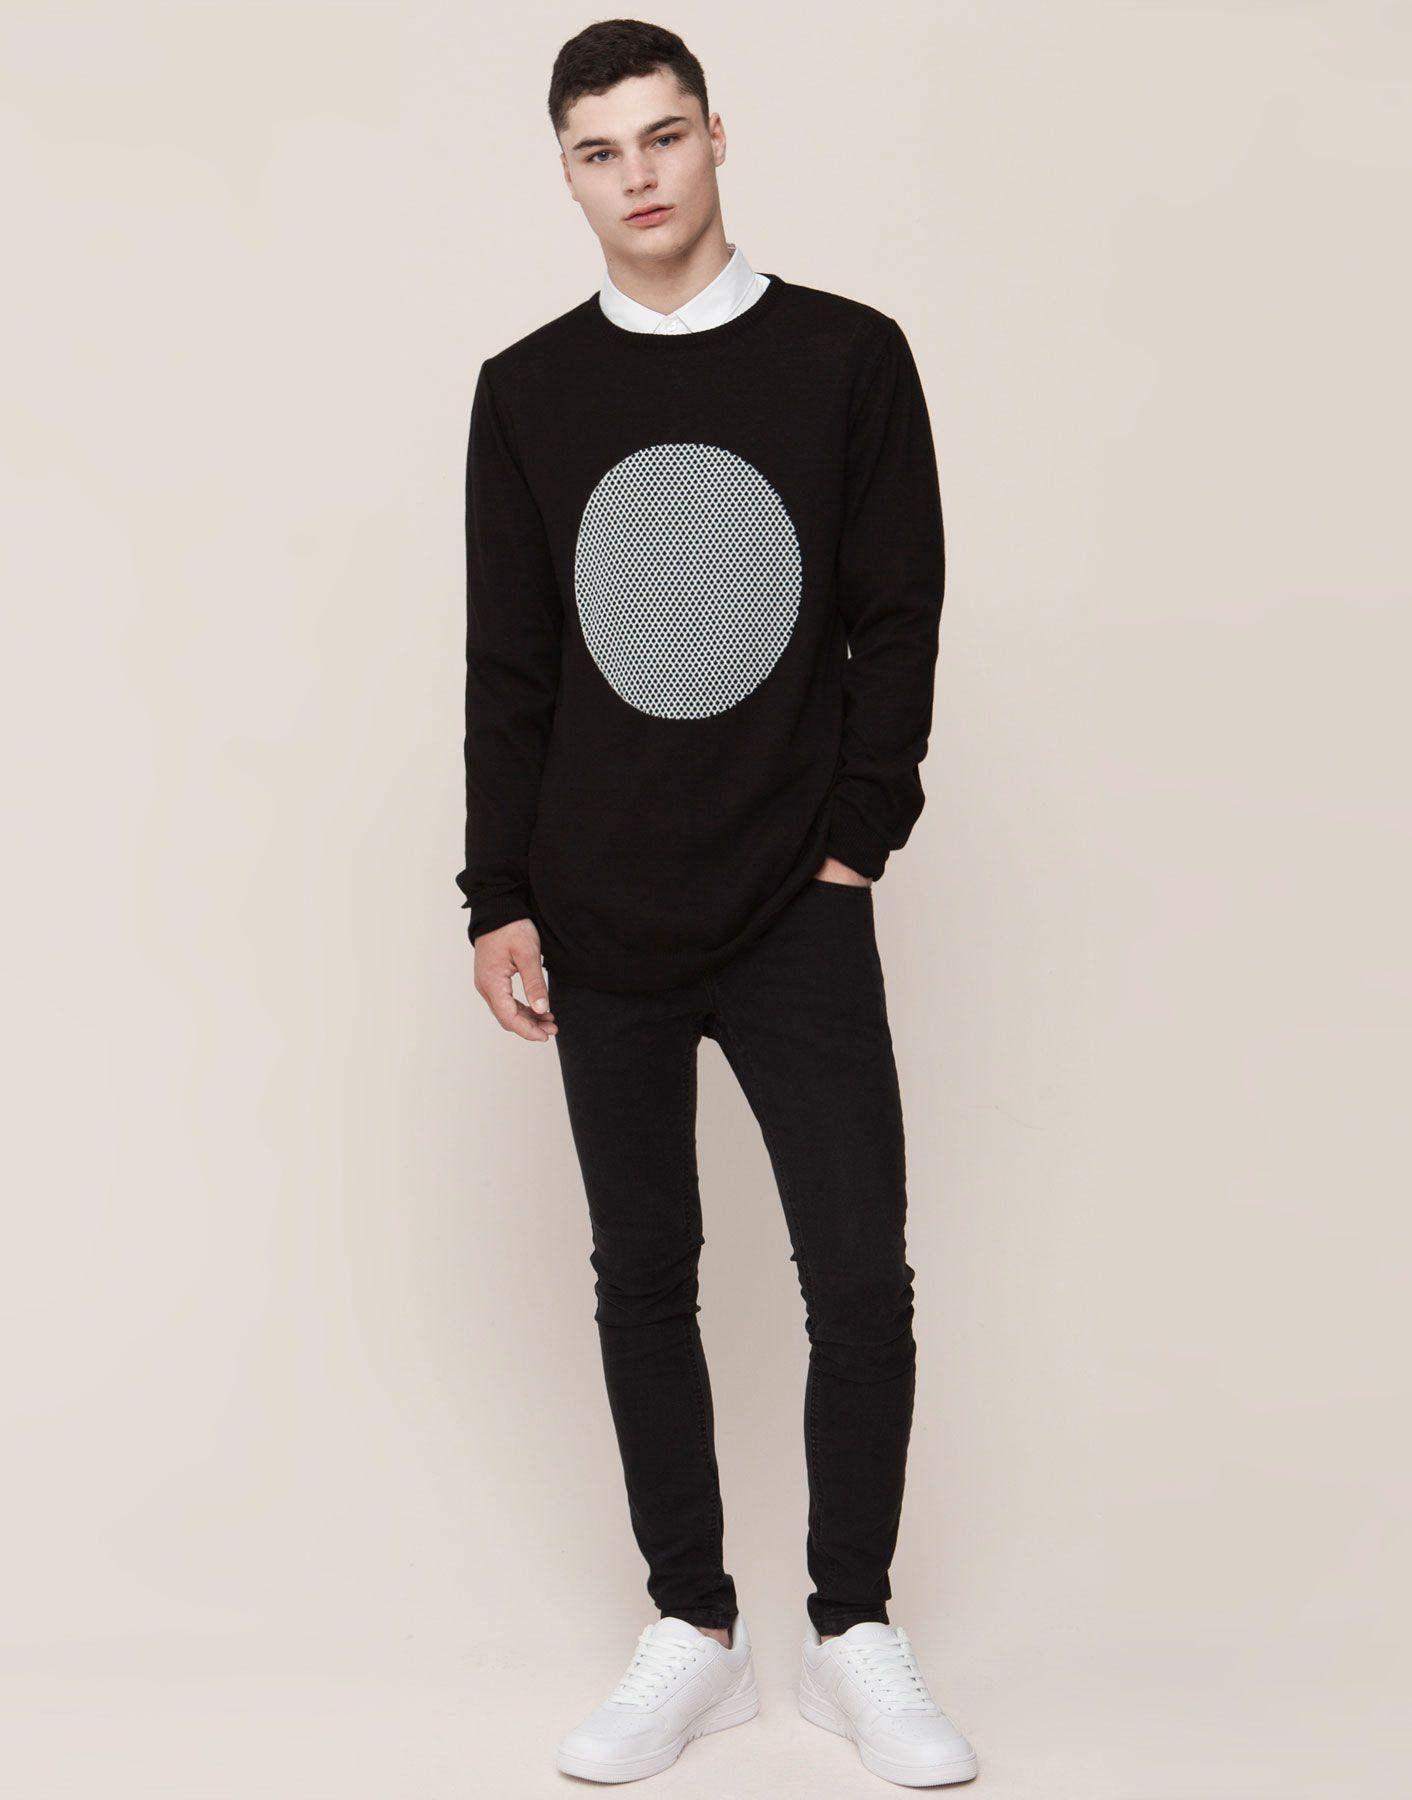 Print Jersey Knitwear Man Pull Bear Israel Knitwear Men Hipster Outfits Mens Shirts